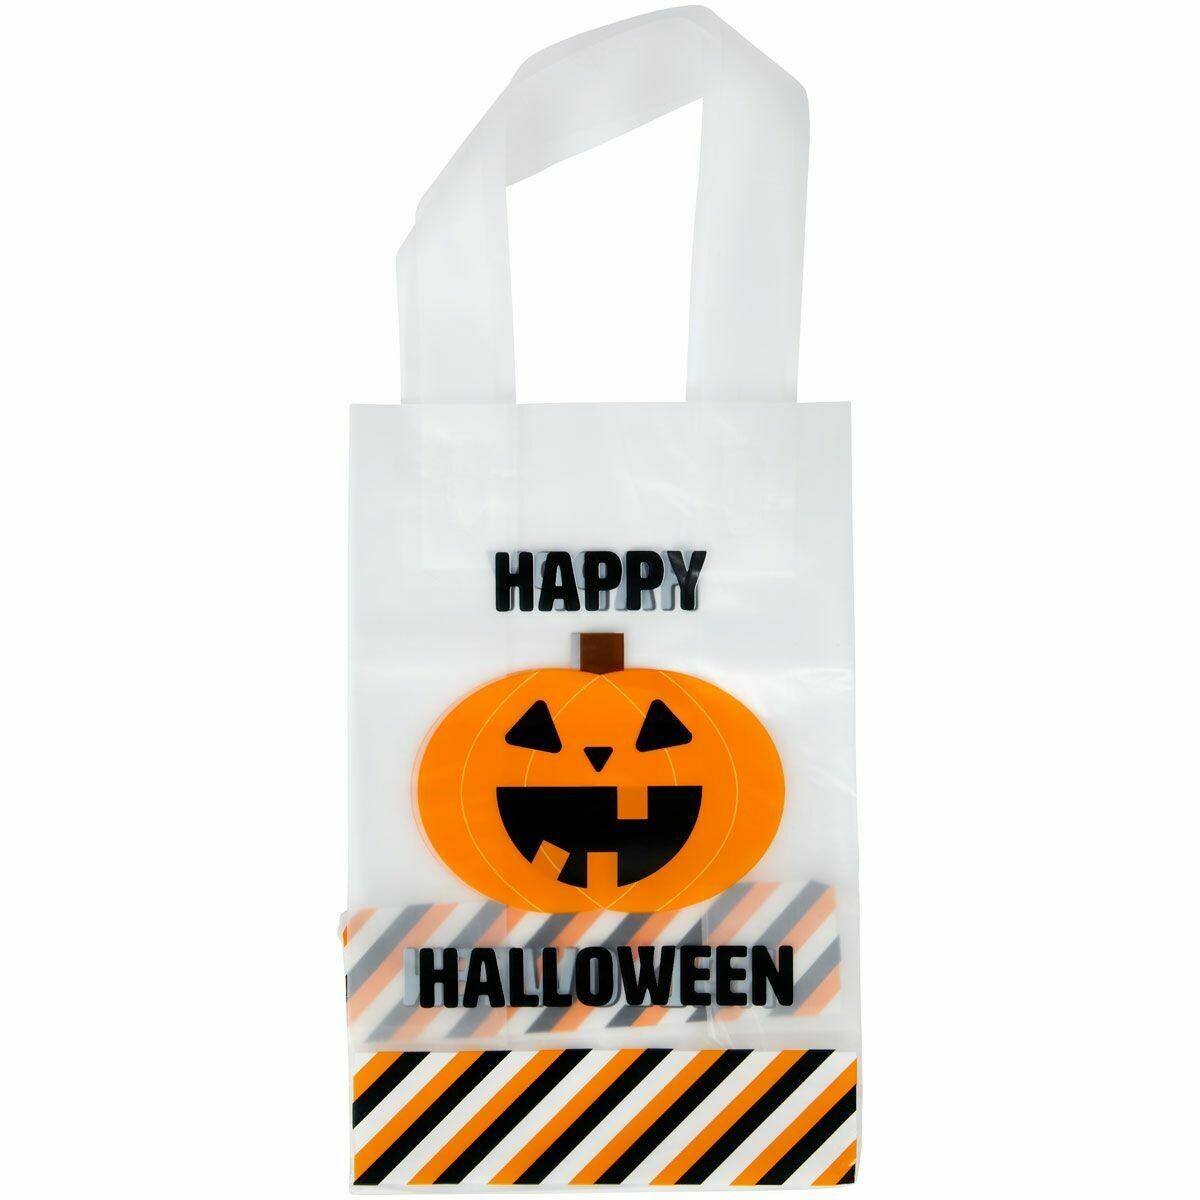 Wilton Halloween Treat Bags HAPPY HALLOWEEN  10τεμ Σακουλάκια για γλυκά με θέμα το Halloween